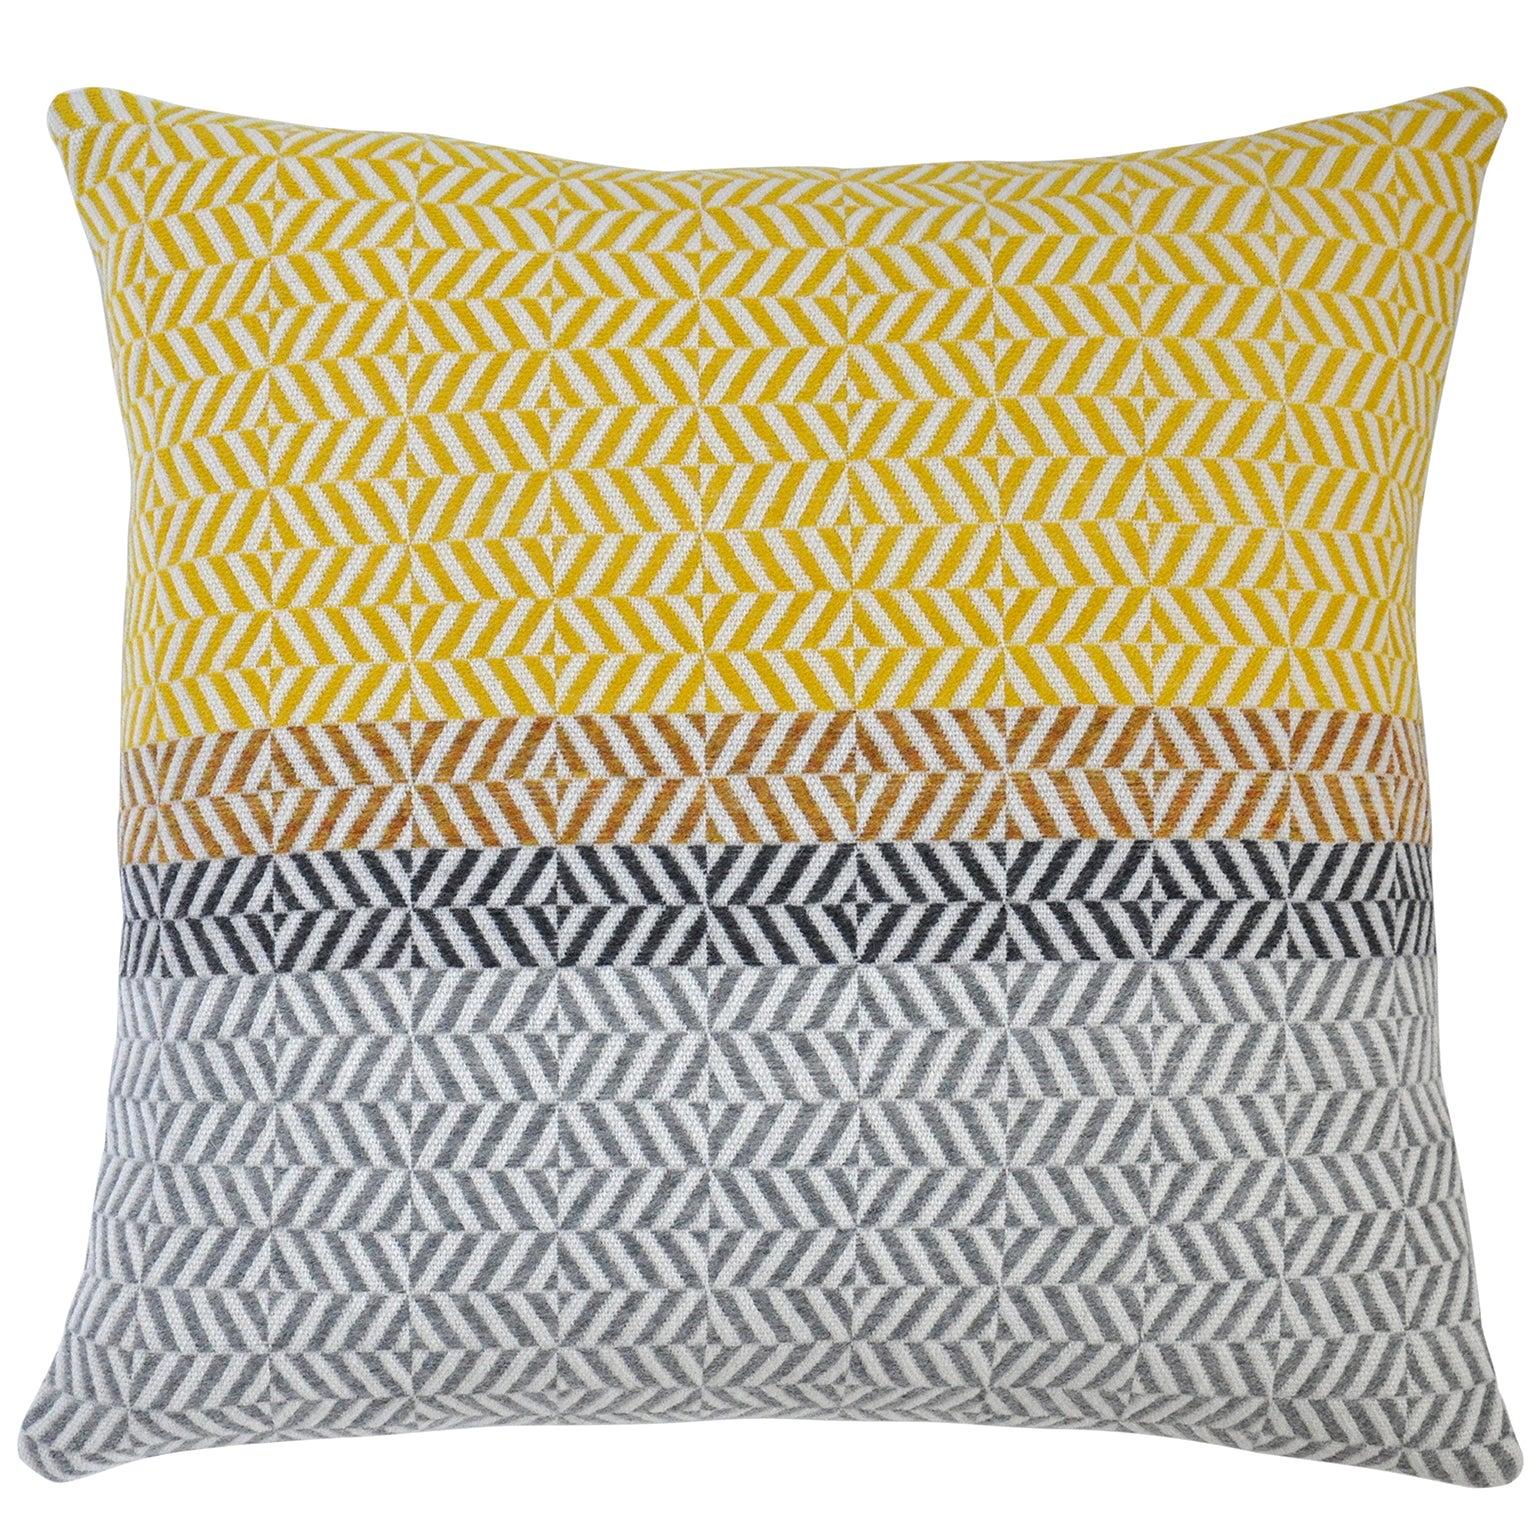 Handwoven 'Uccle' Block Geometric Merino Wool Cushion Pillow, Piccalilli / Grey